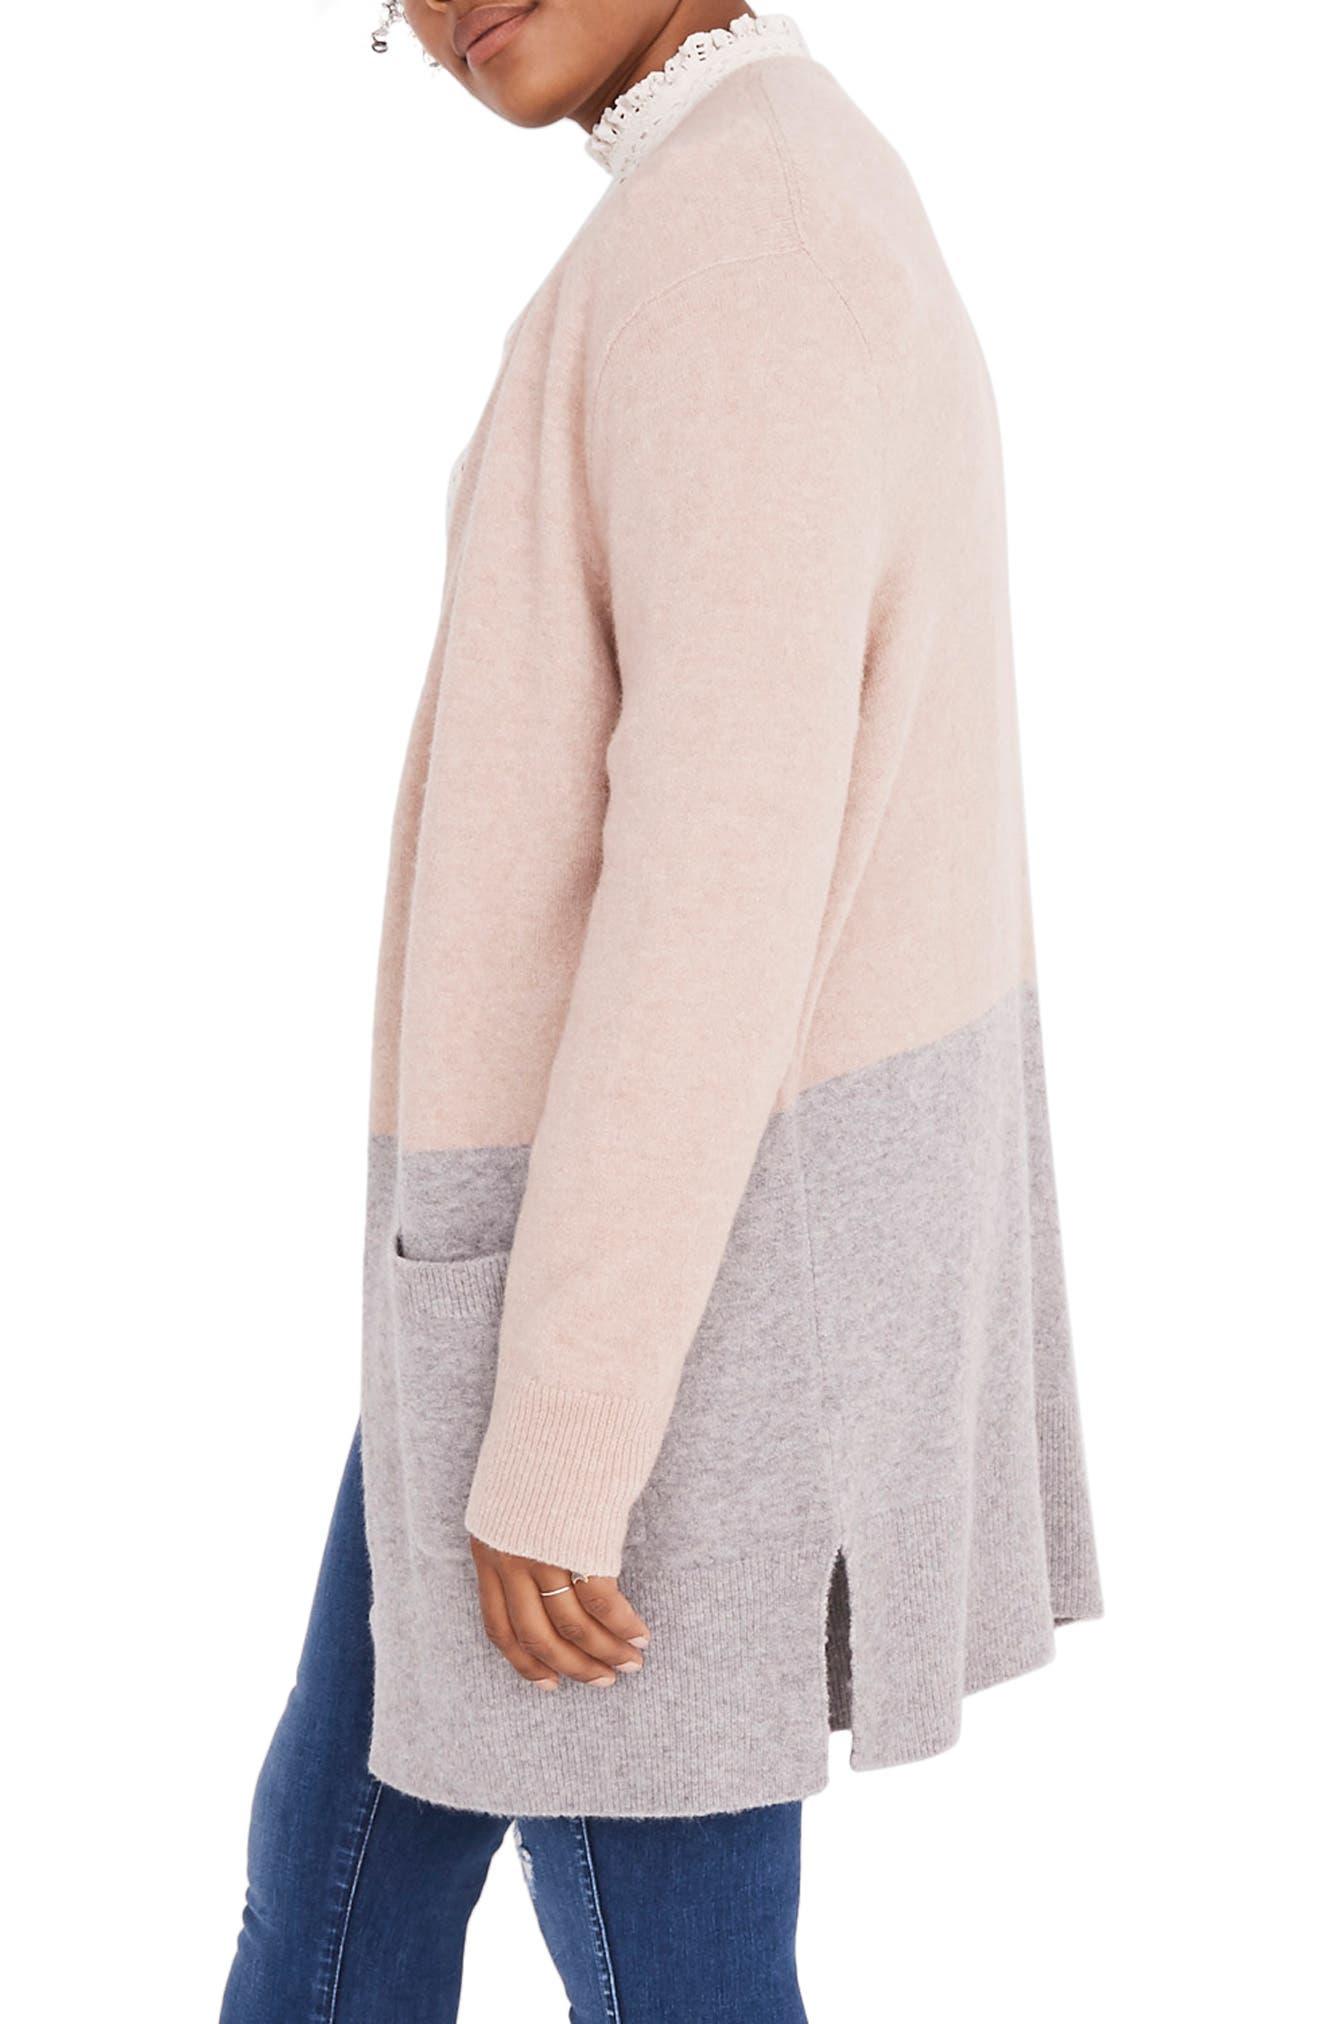 Kent Colorblock Cardigan Sweater,                             Alternate thumbnail 7, color,                             HEATHER BEIGE